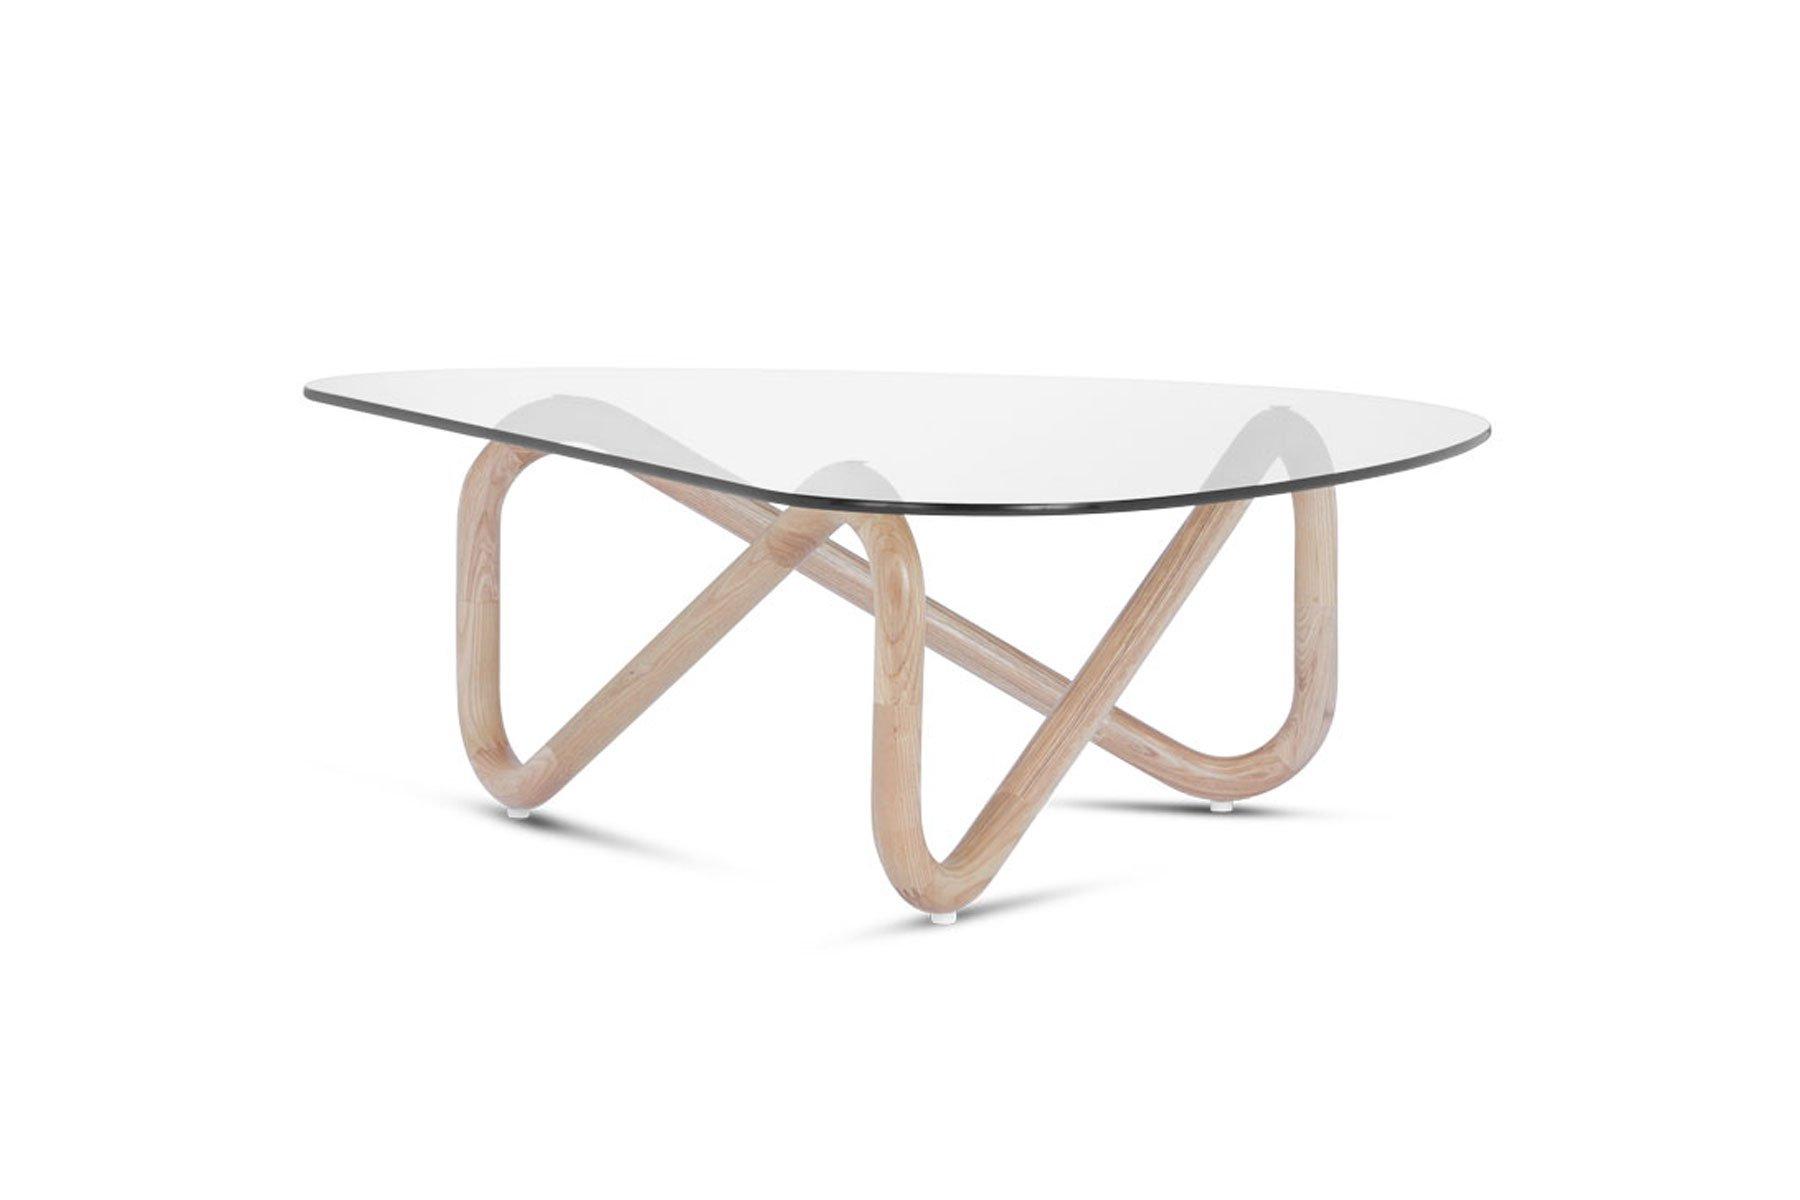 CATALANO-SKU-IOT10TP900-SPIRAL-COFFEE-TABLE-ASH-GLASS2111